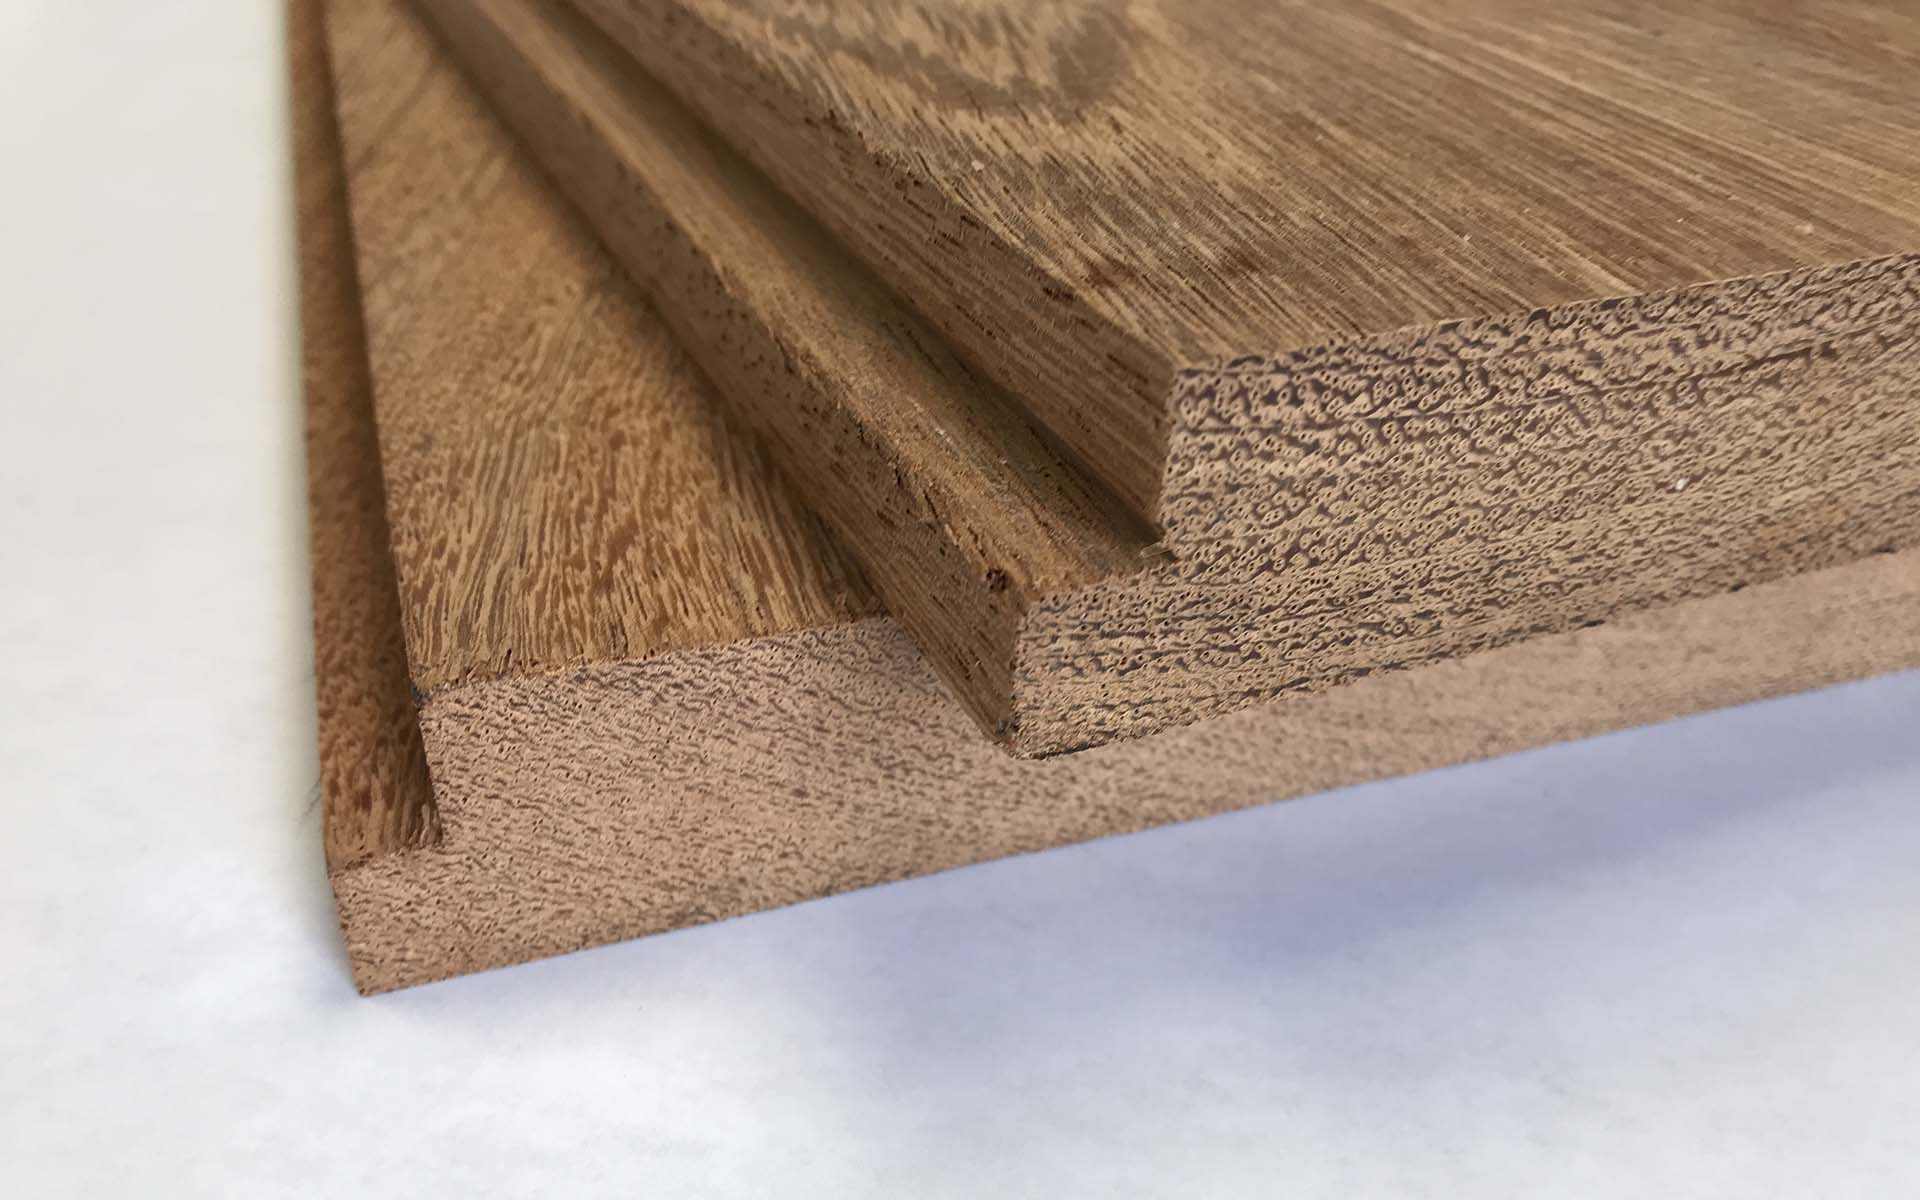 praters hardwood flooring chattanooga of buy trailer decking apitong shiplap rough boards truck flooring regarding 3 angelim pedra shiplap close up